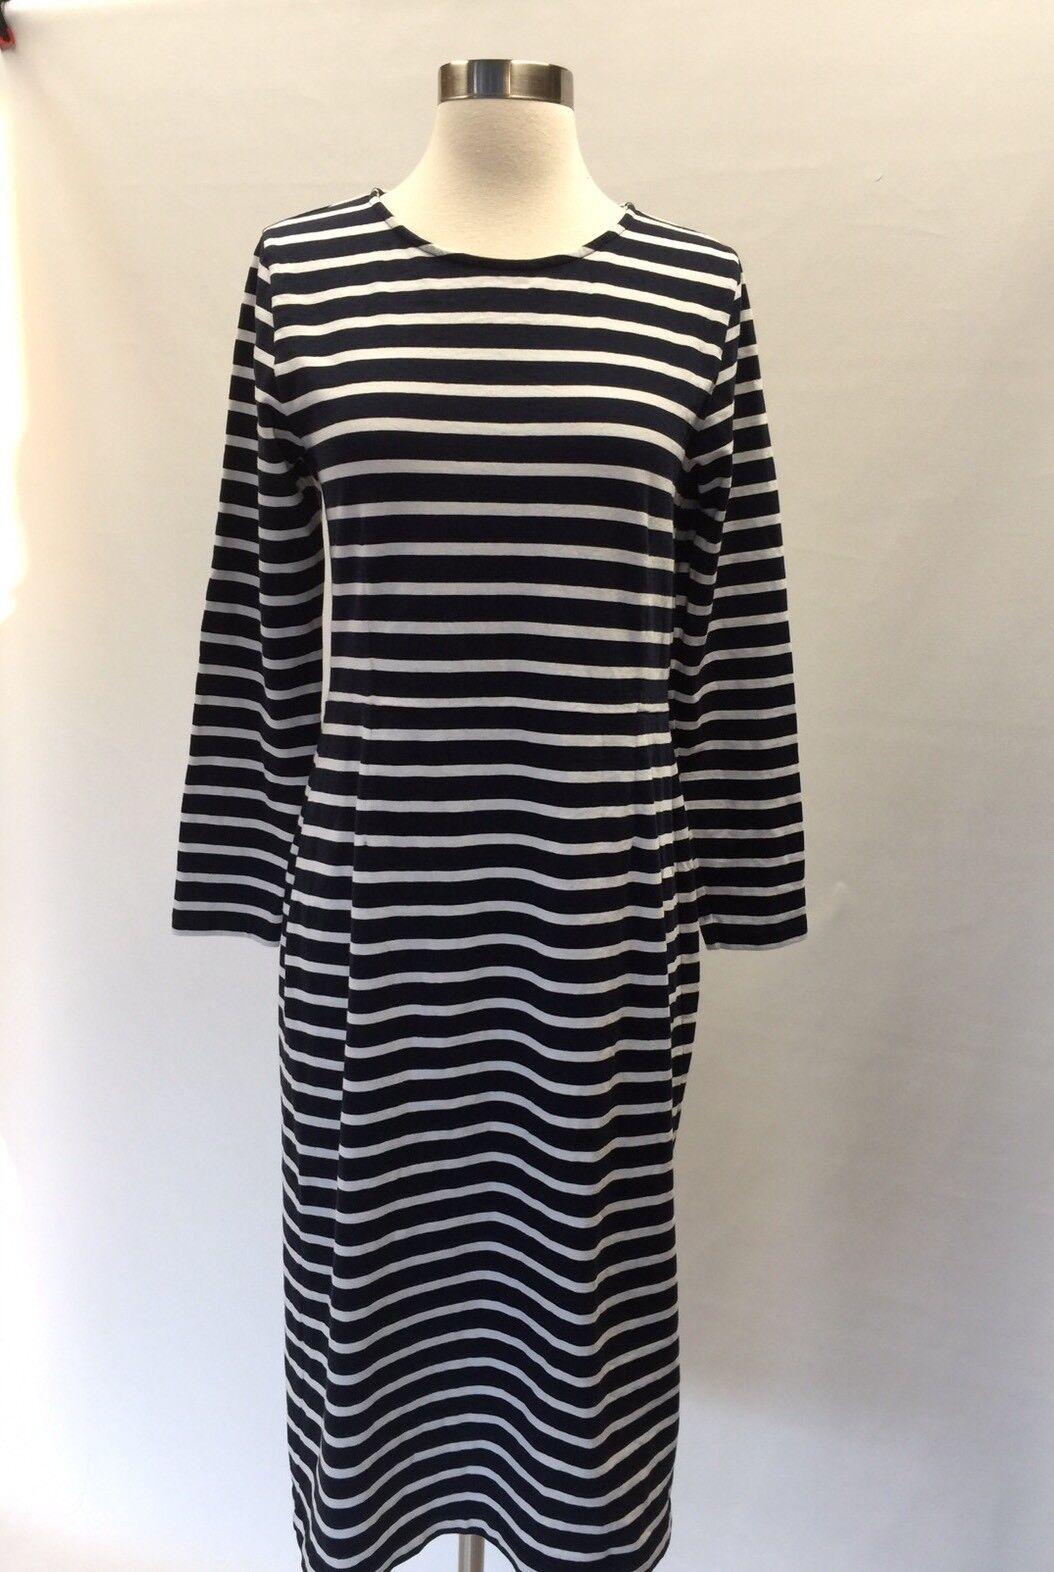 J.Crew Long Sleeve Navy Weiß Striped Cotton Sheath Dress G7980 Größe 10 New